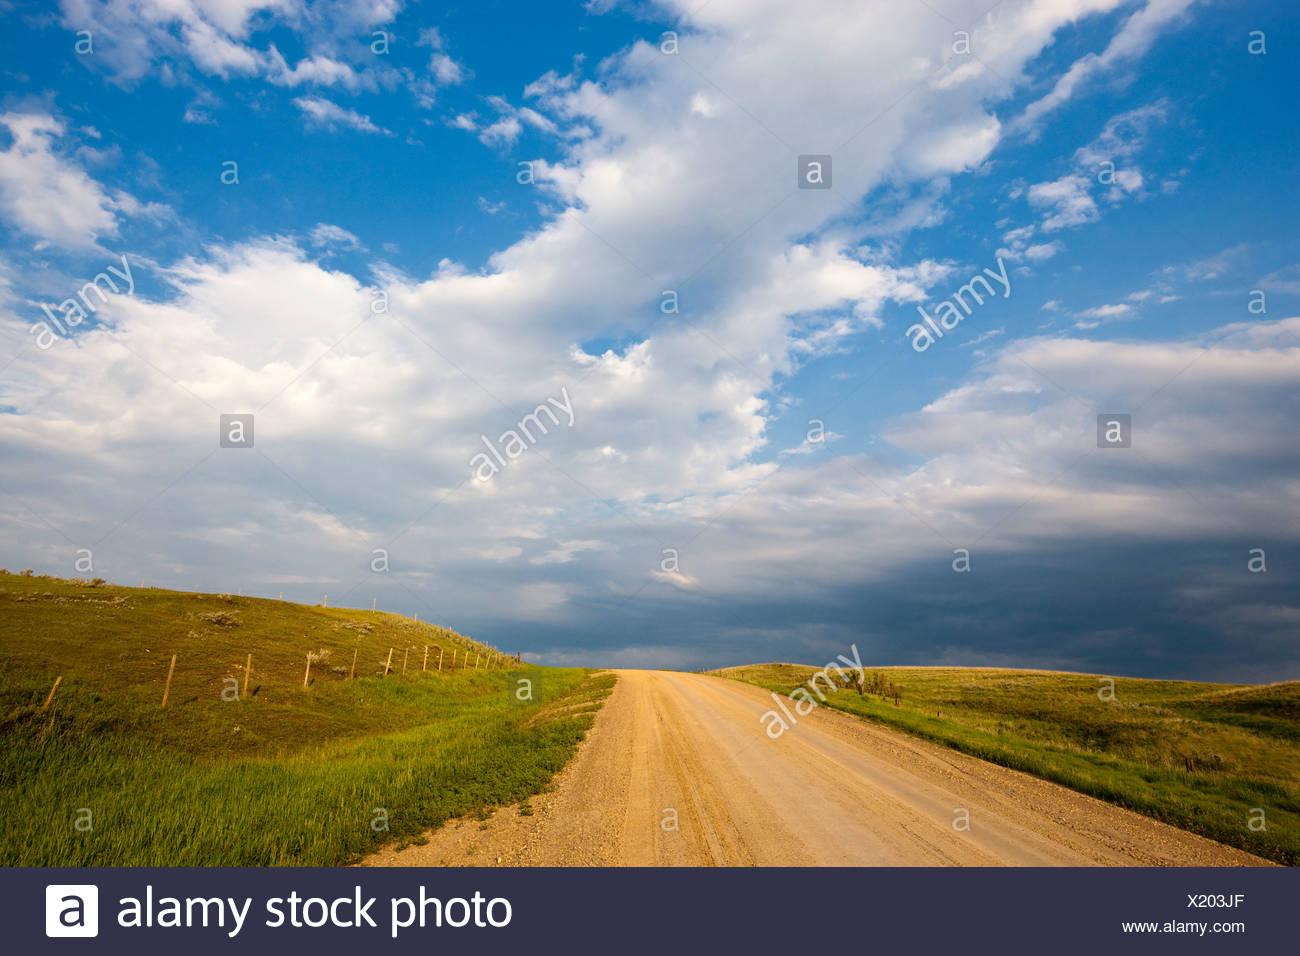 Clay road near Morse, Saskatchewan, Canada. - Stock Image